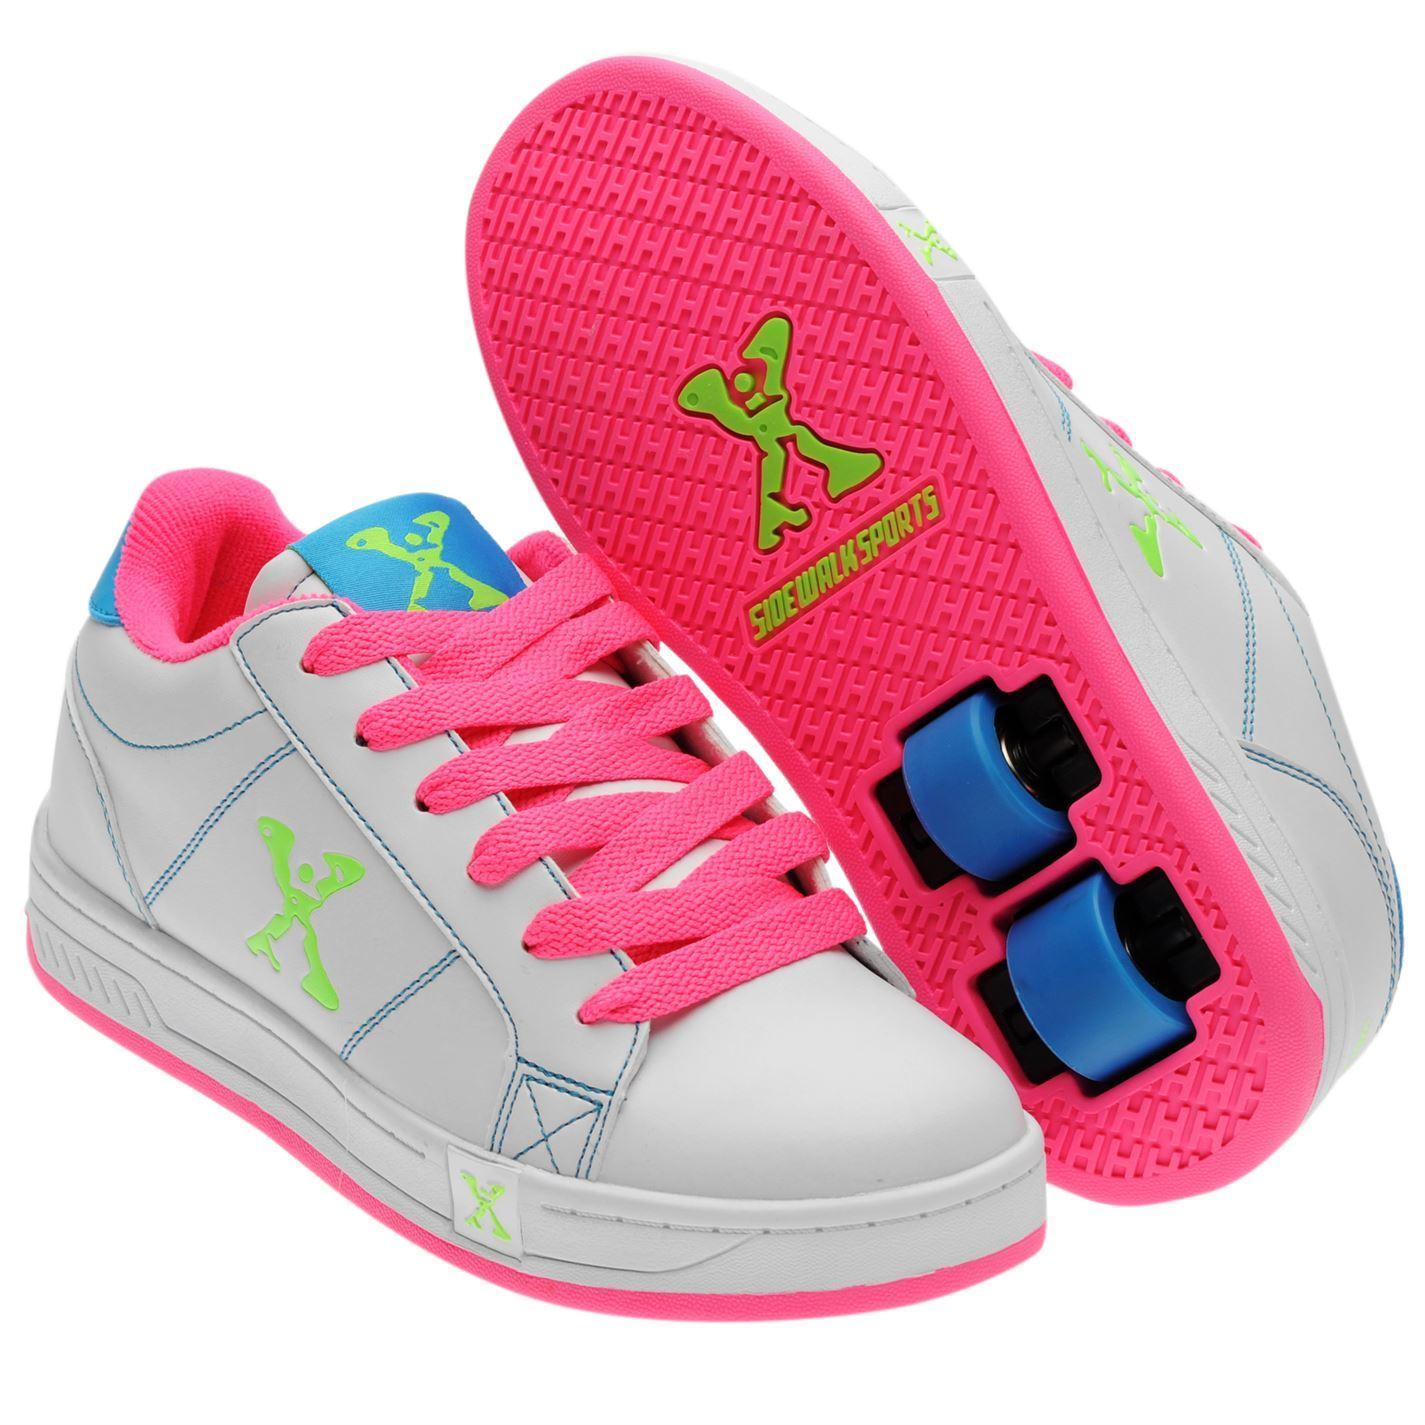 Roller tennis shoes - Sidewalk Sport Kids Lane Girls Lace Up Flat